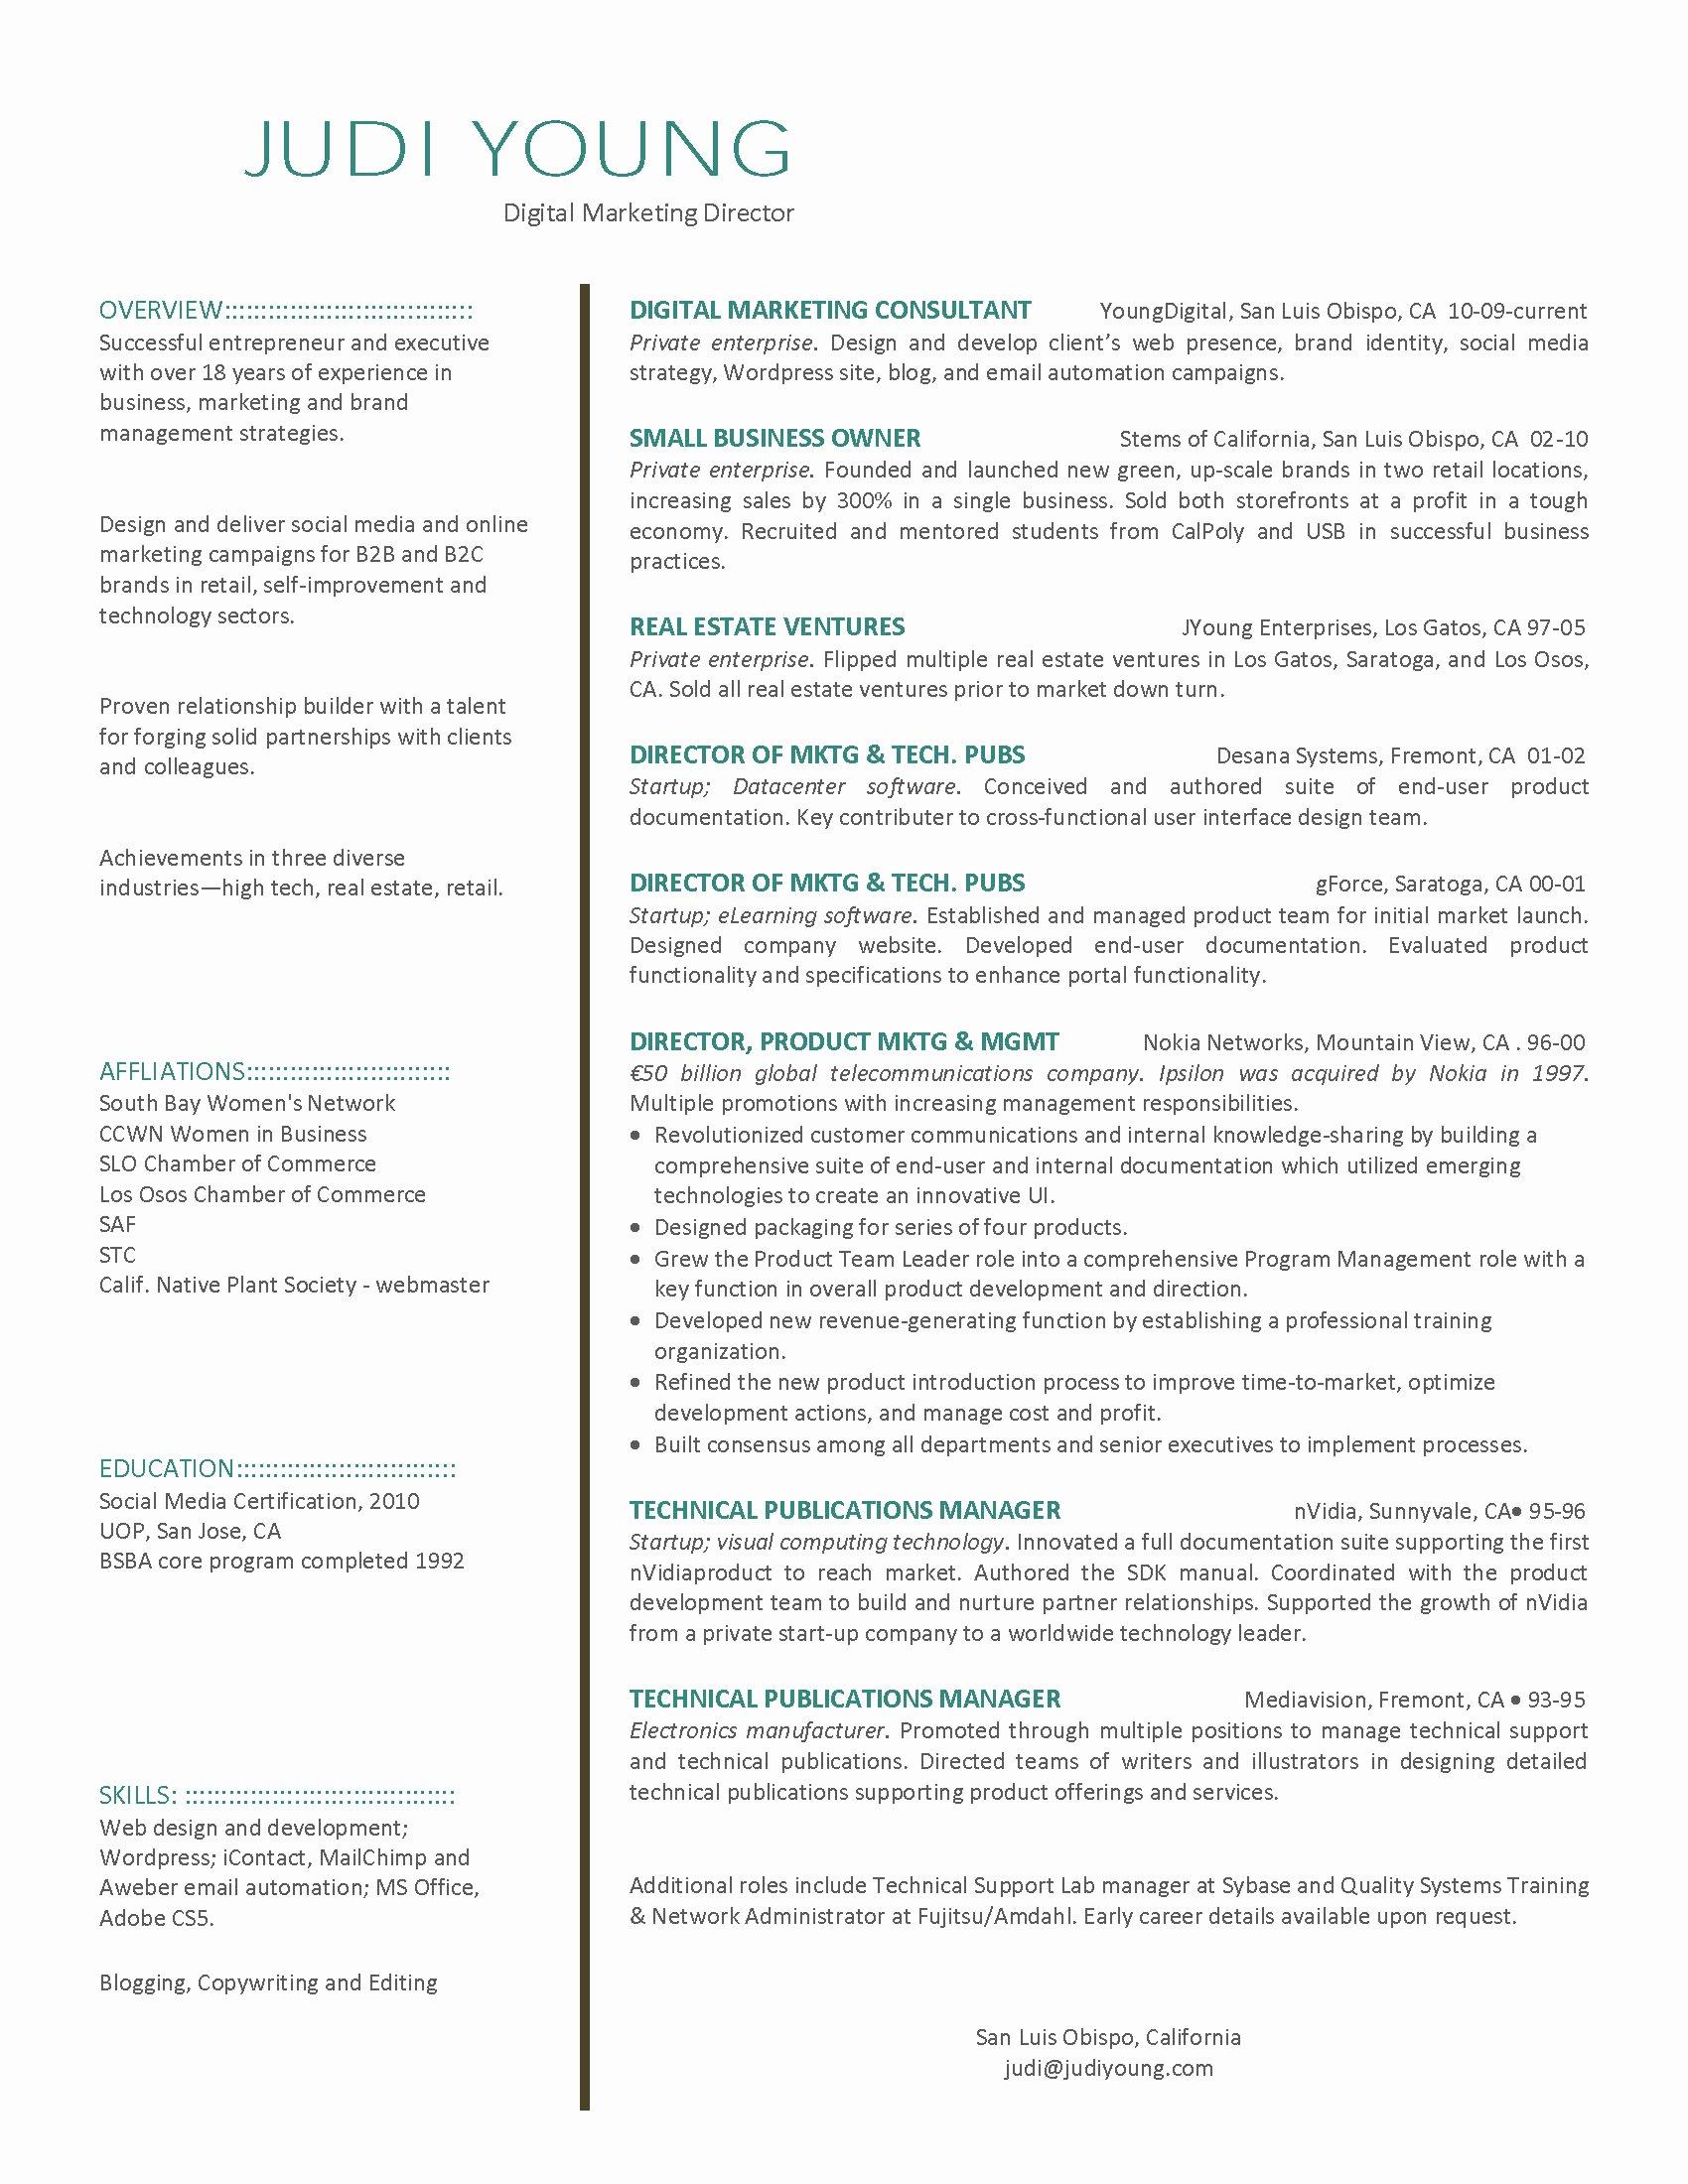 Digital Marketing Resume Template Best Of Digital Marketing Resume